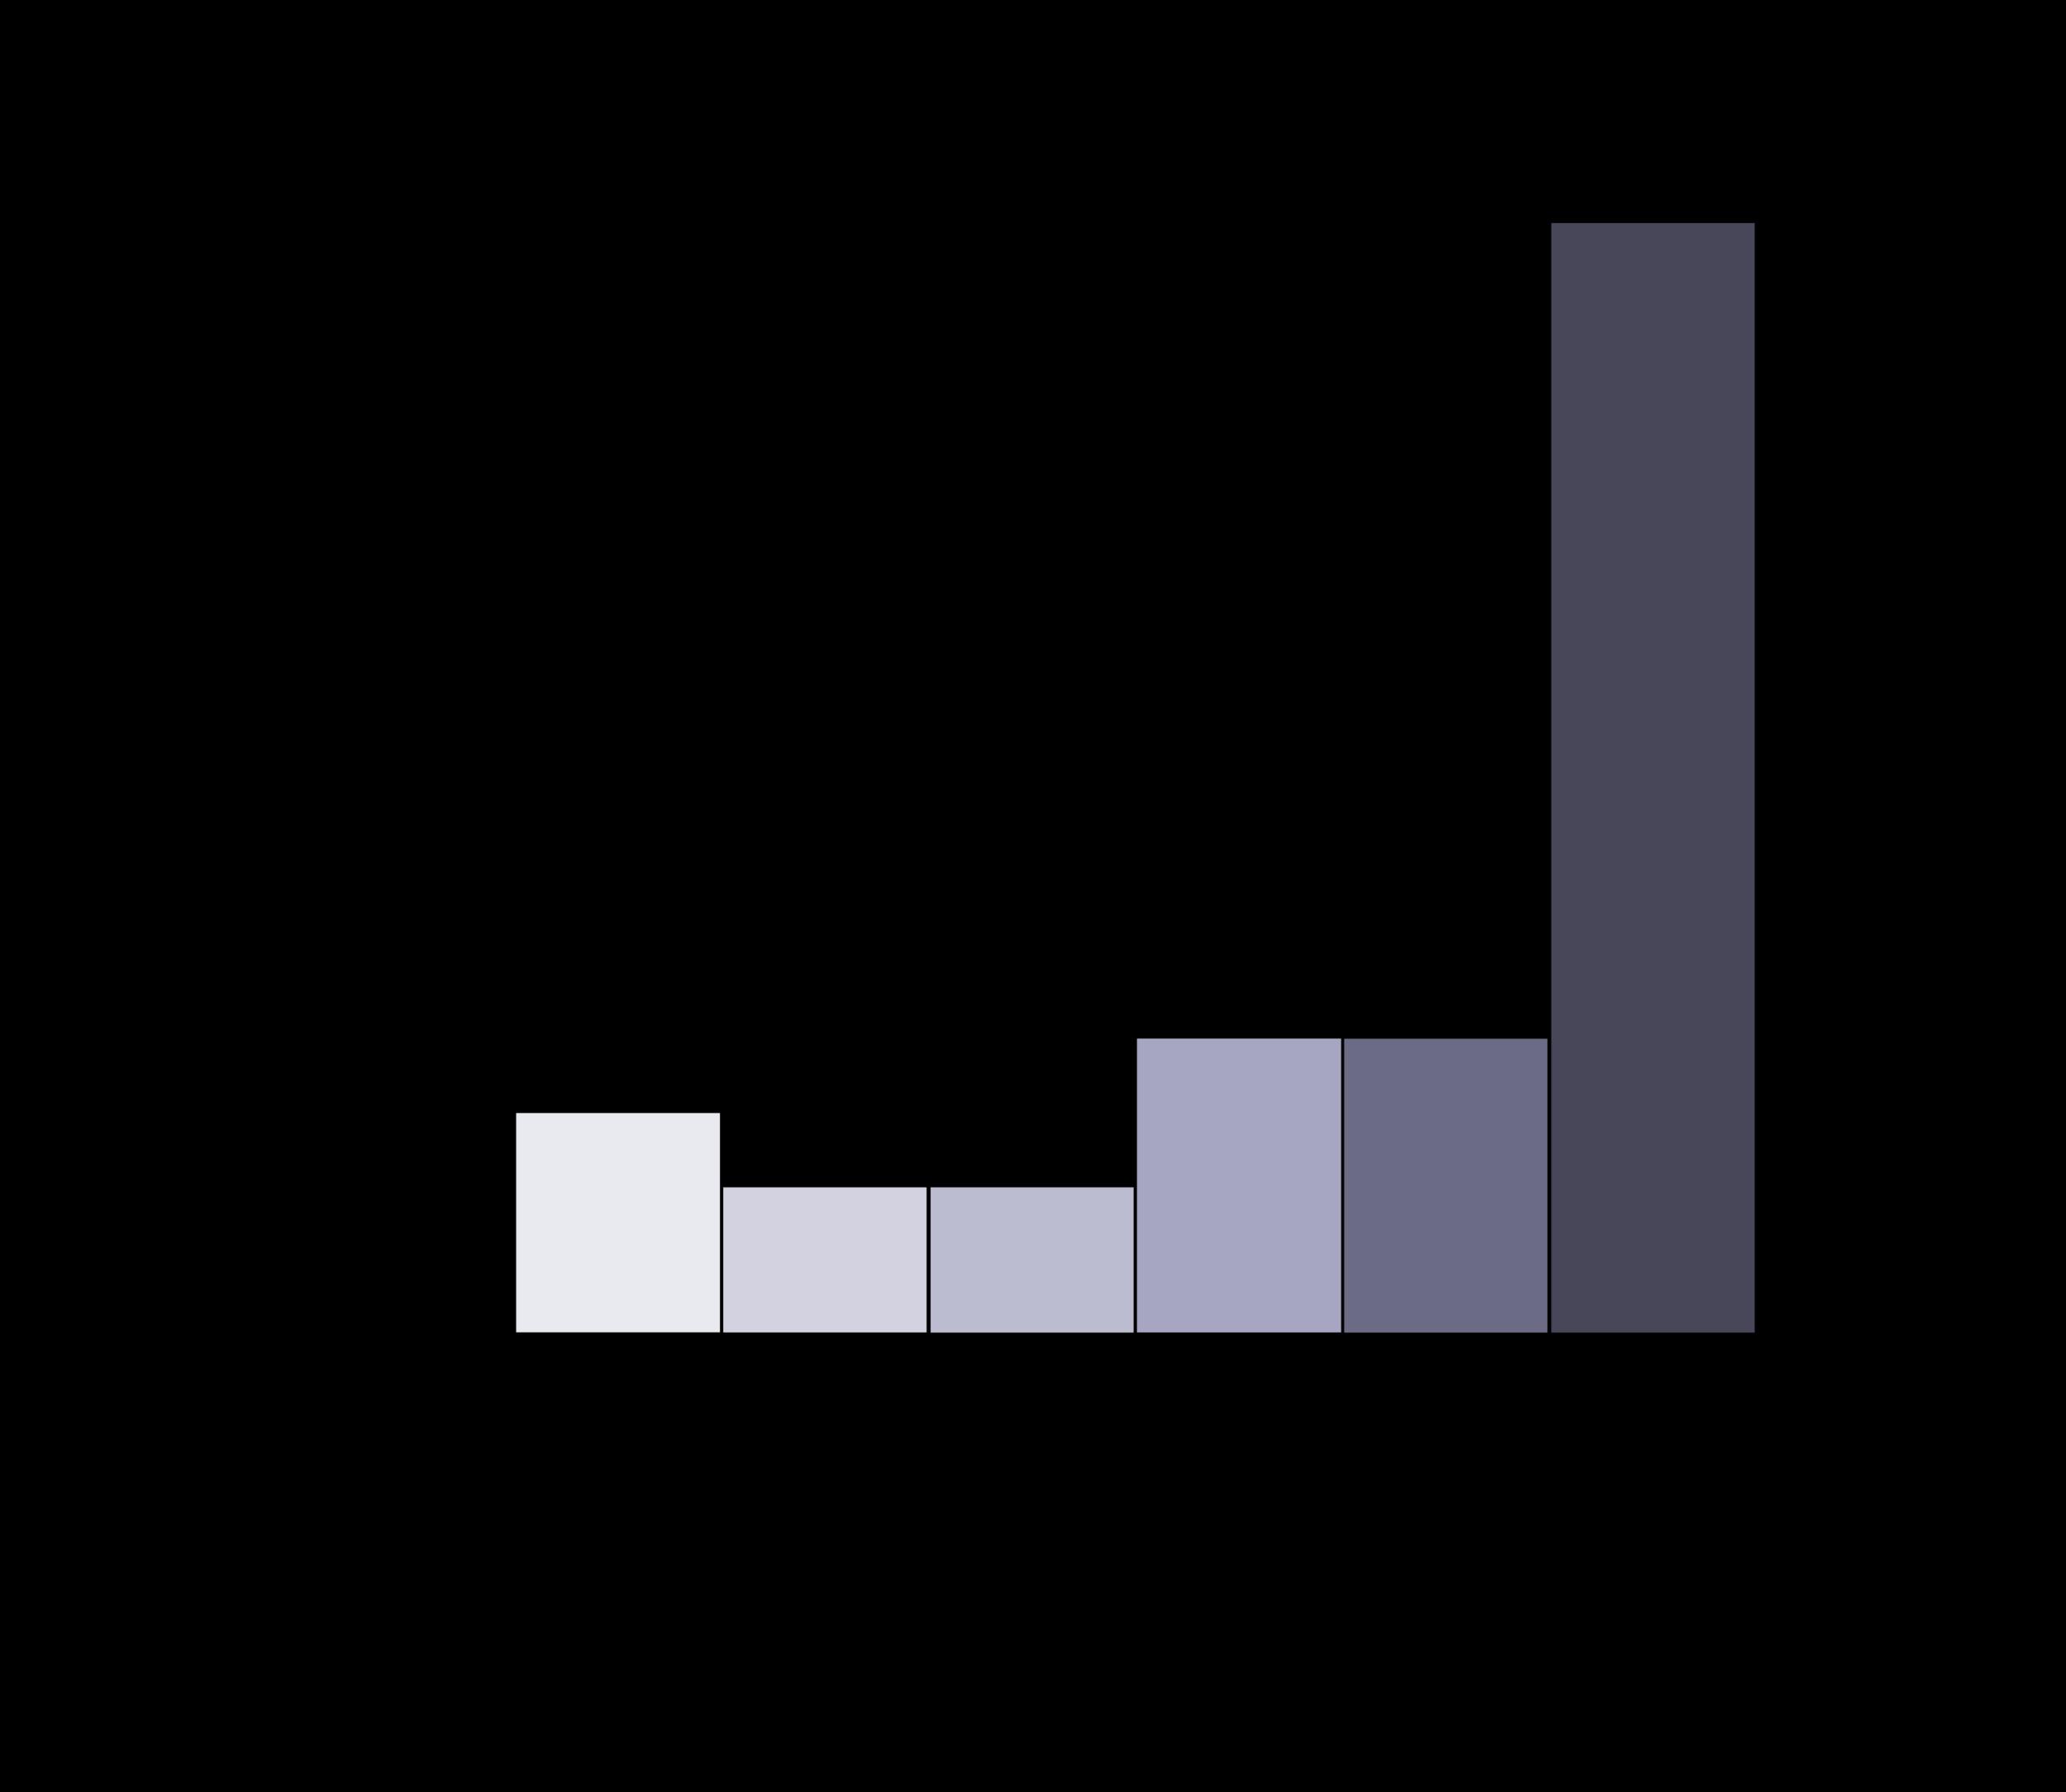 graphArtboard 1@4x.png